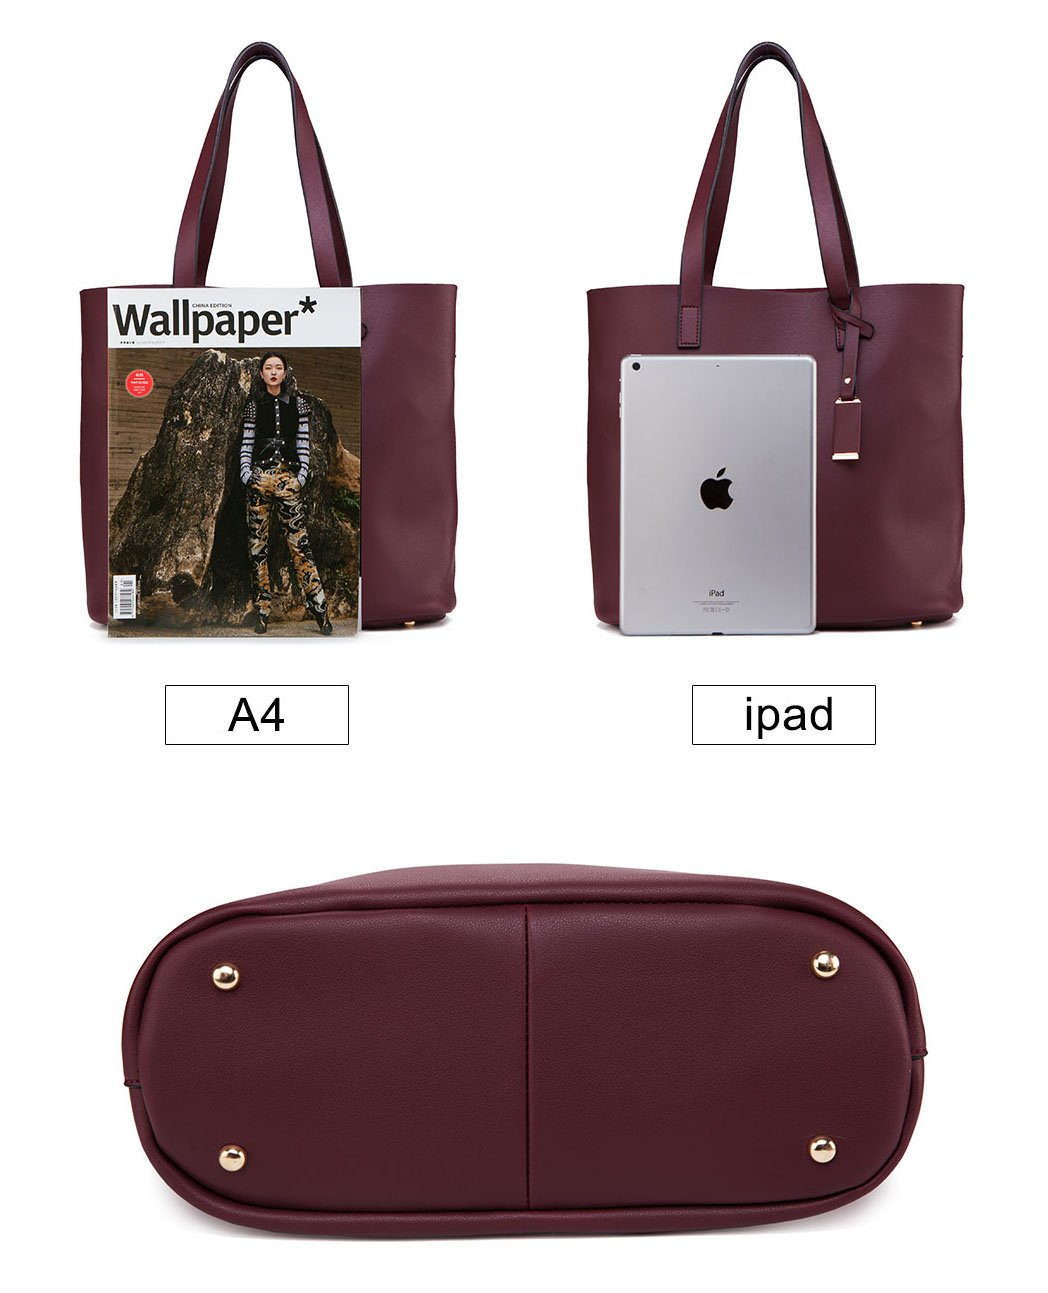 0b9b48e956520 ilishop PU Leather Handbag Designer Pures - Pure Color Large Capacity  Shoulder Bag-Classical Tote